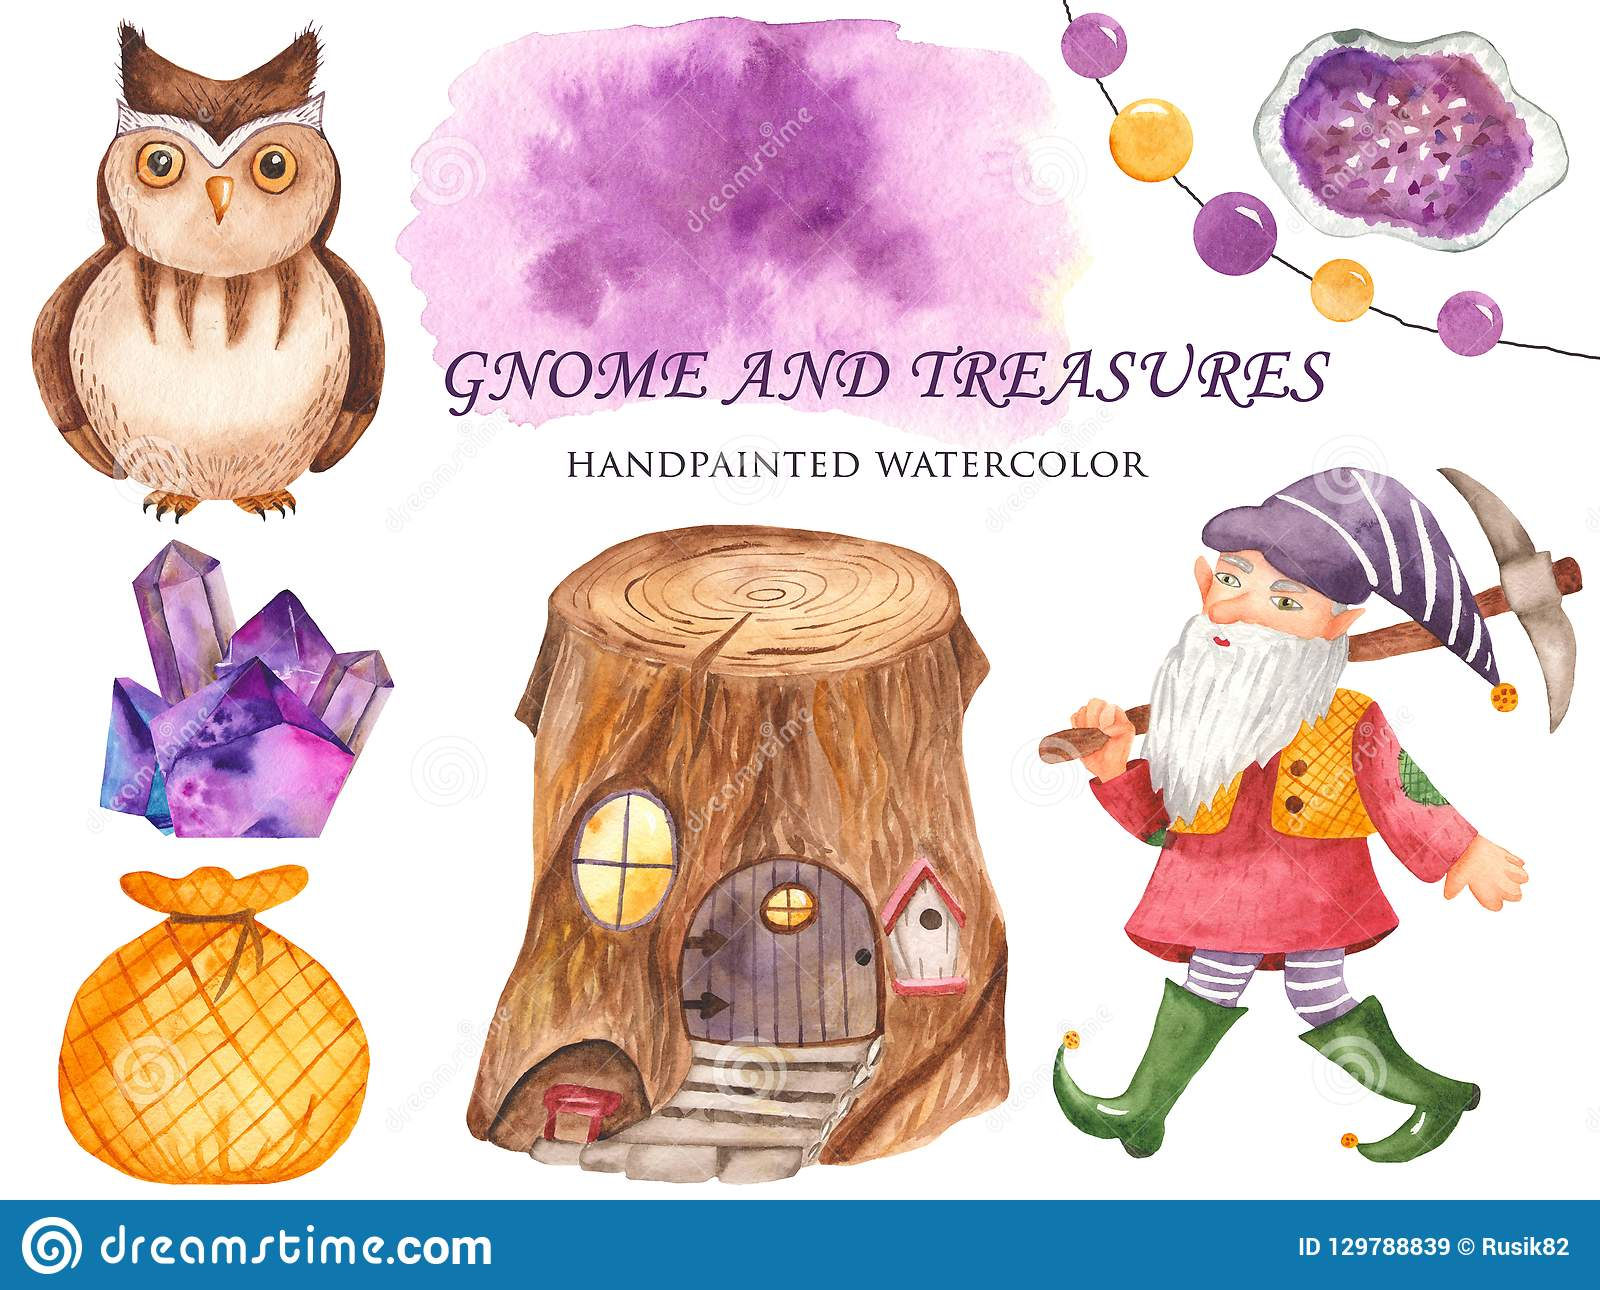 Watercolor set of gnome, owls, stump houses, crystals, a bag of treasure.